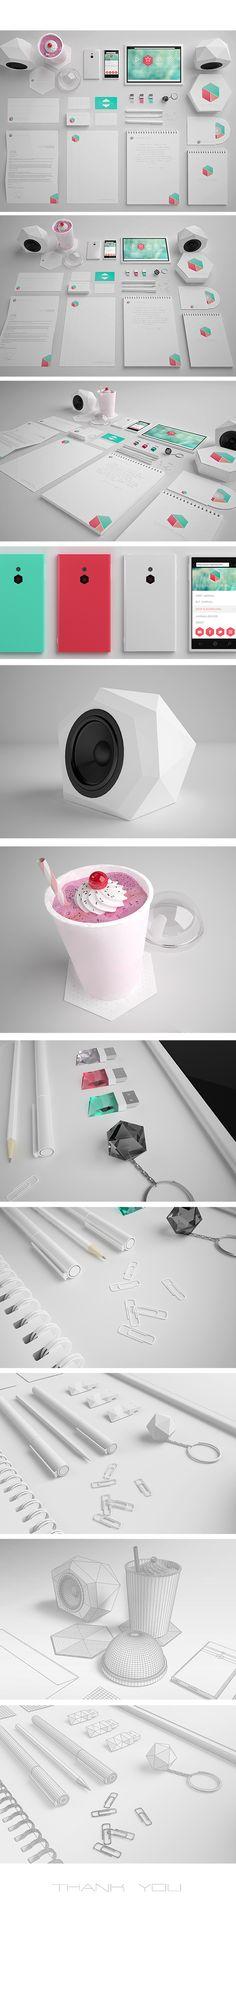 Marmal Brand Identity by Monika Kusheva, via Behance #identity #packaging #branding #marketing PD